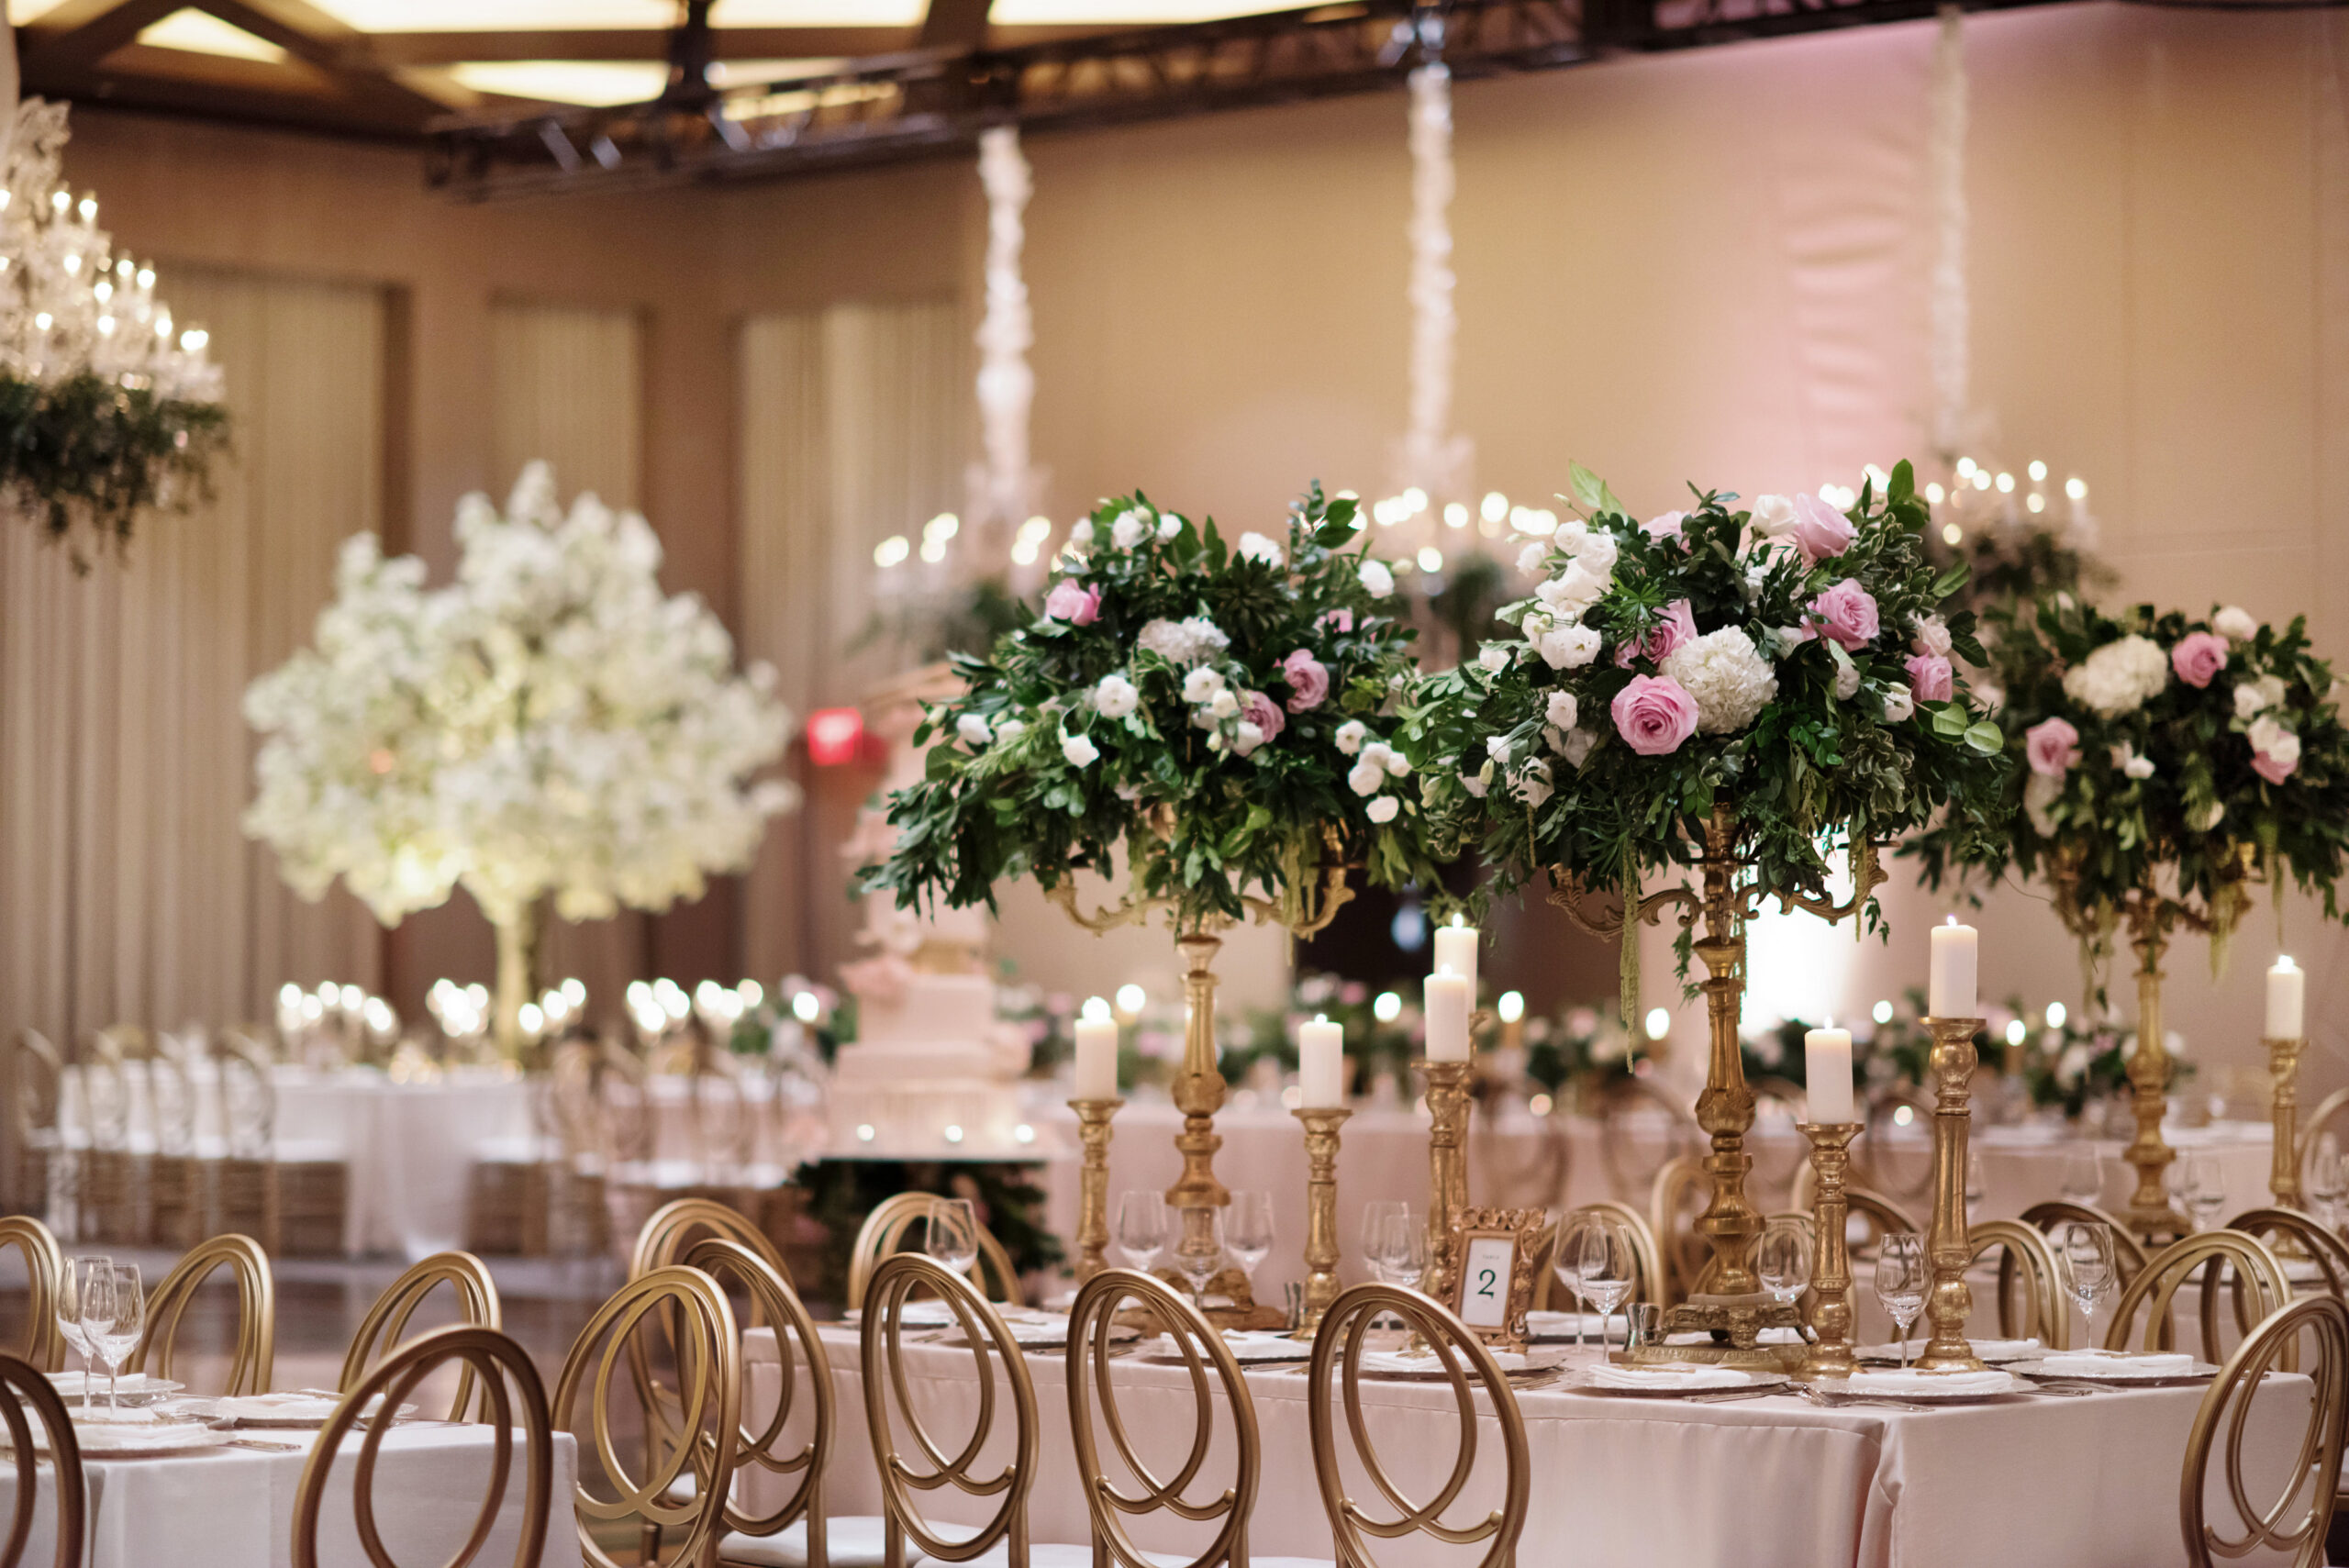 https://secureservercdn.net/45.40.145.151/kgq.ab5.myftpupload.com/wp-content/uploads/2020/04/Sanam-Soroush-s-Wedding-wedluxe-submission-0069-scaled.jpg?time=1600462602